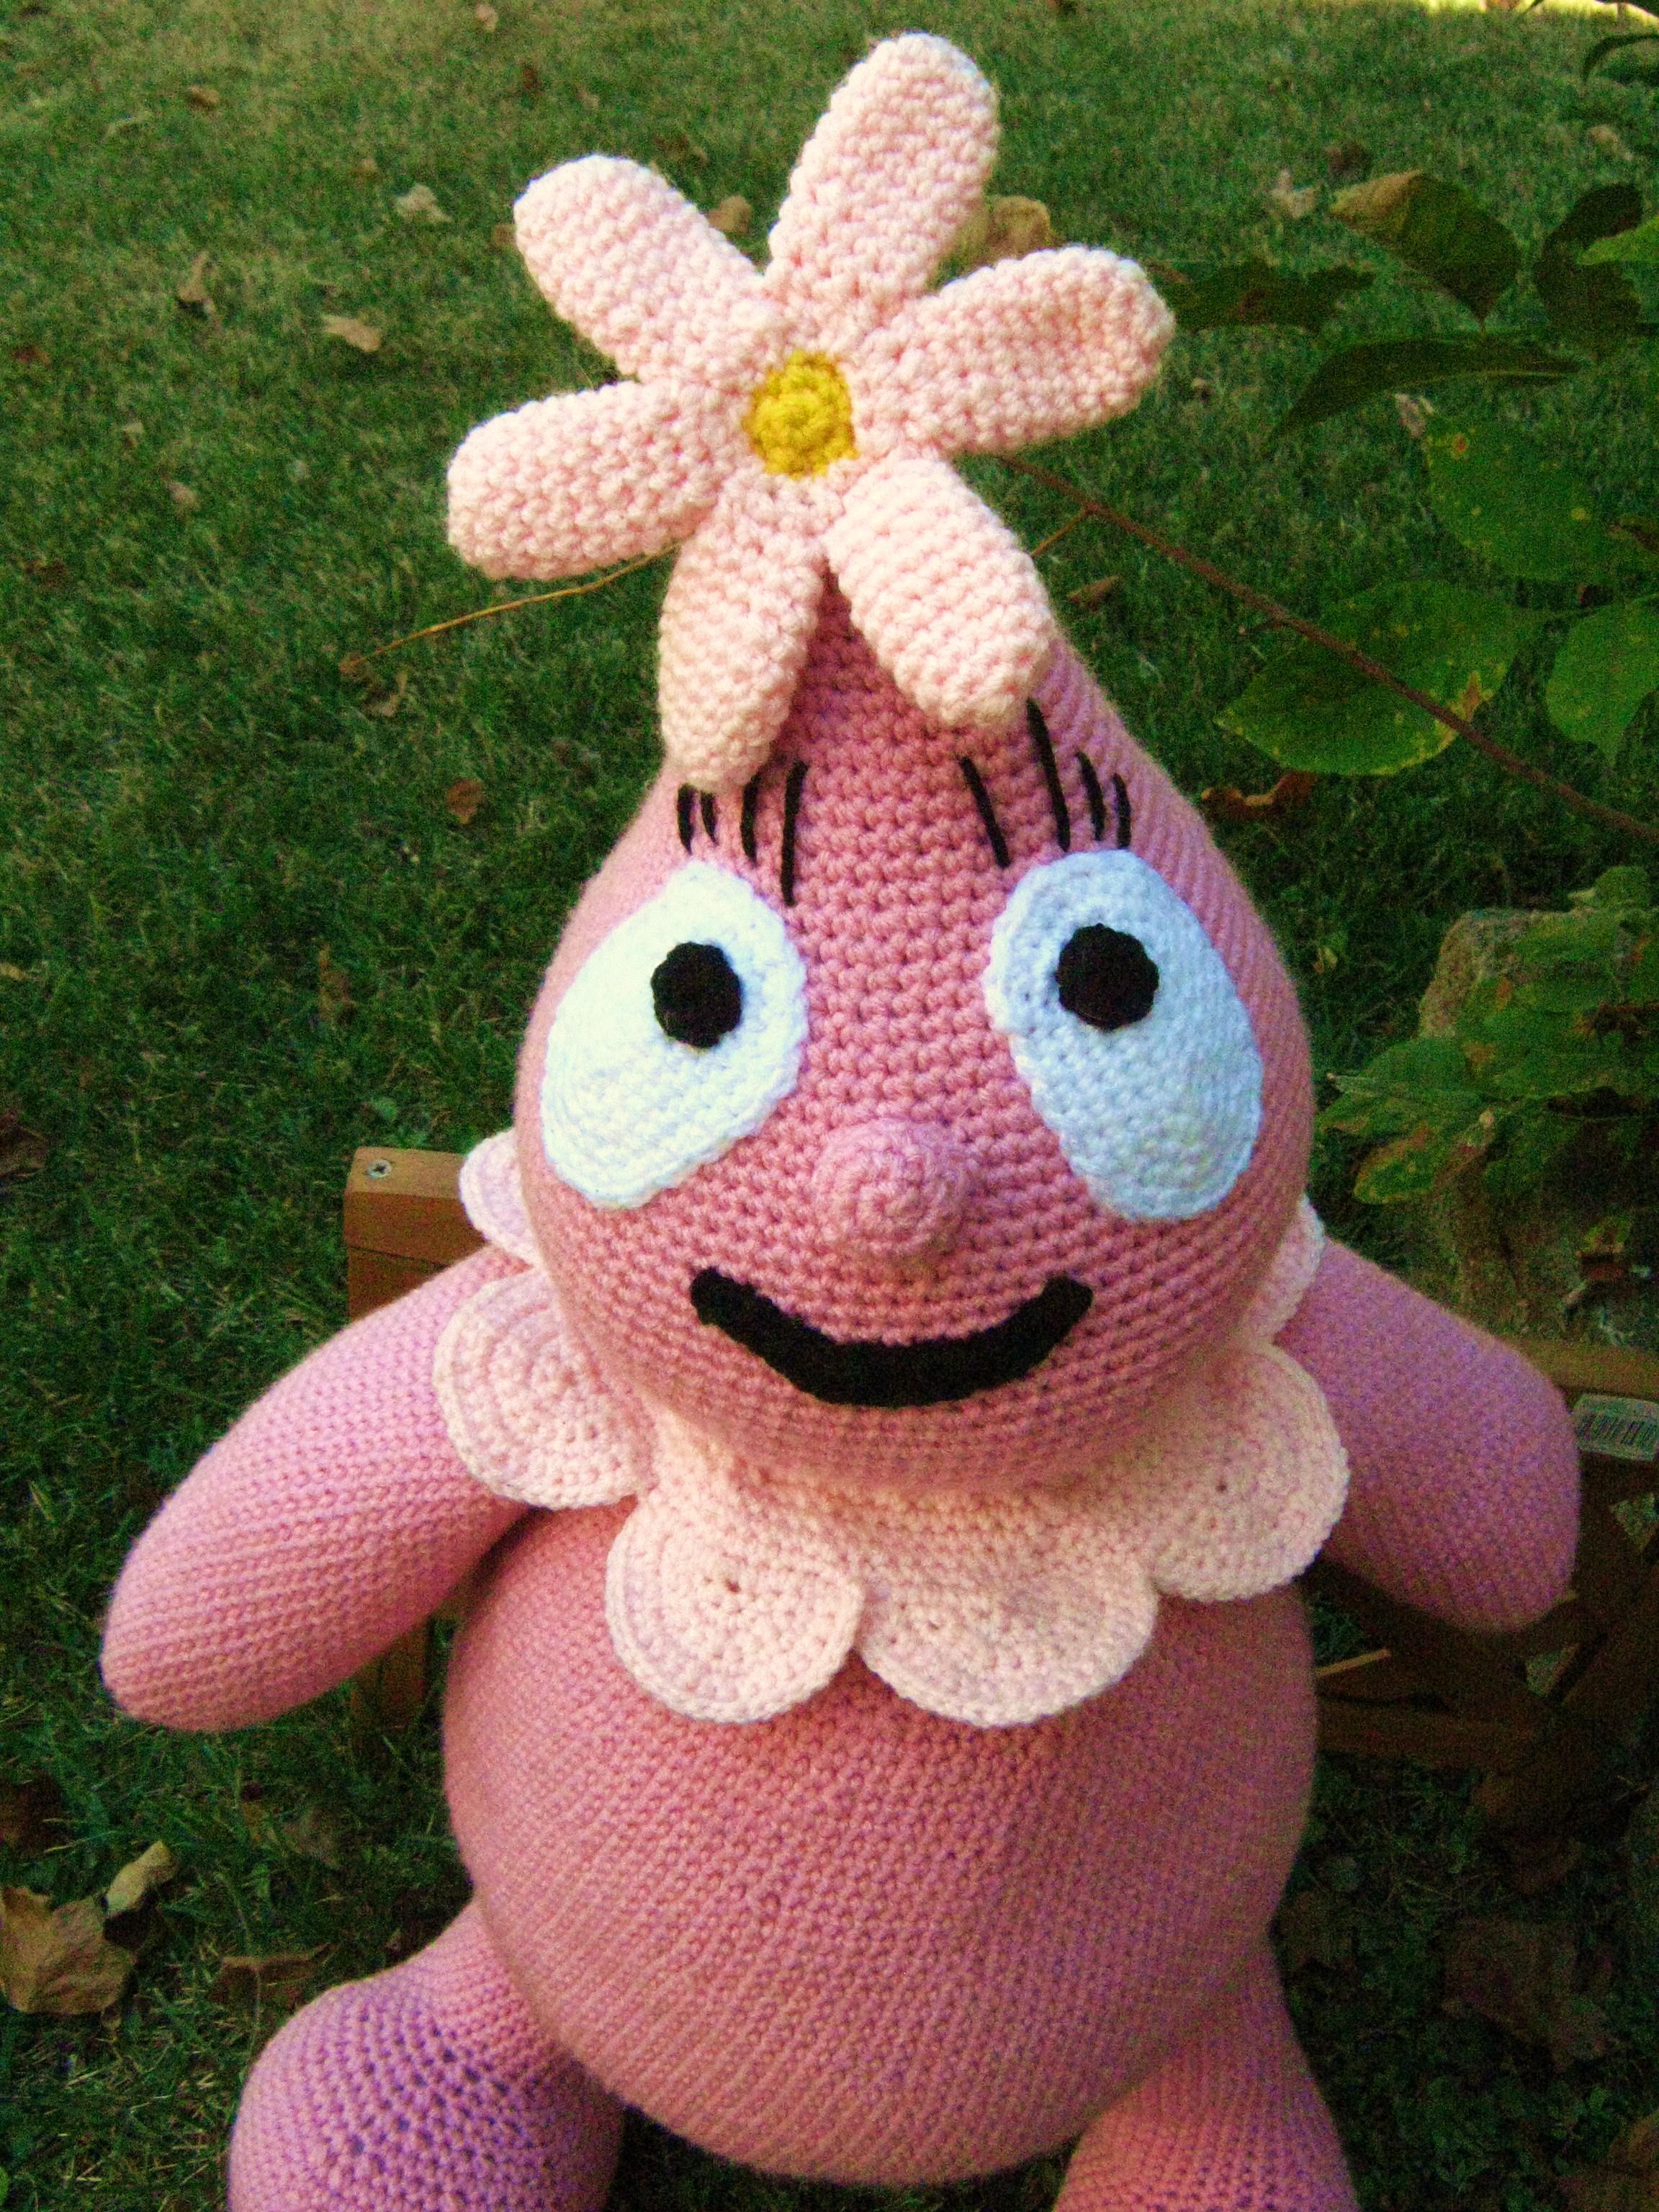 Foofa Crochet Pattern – Free